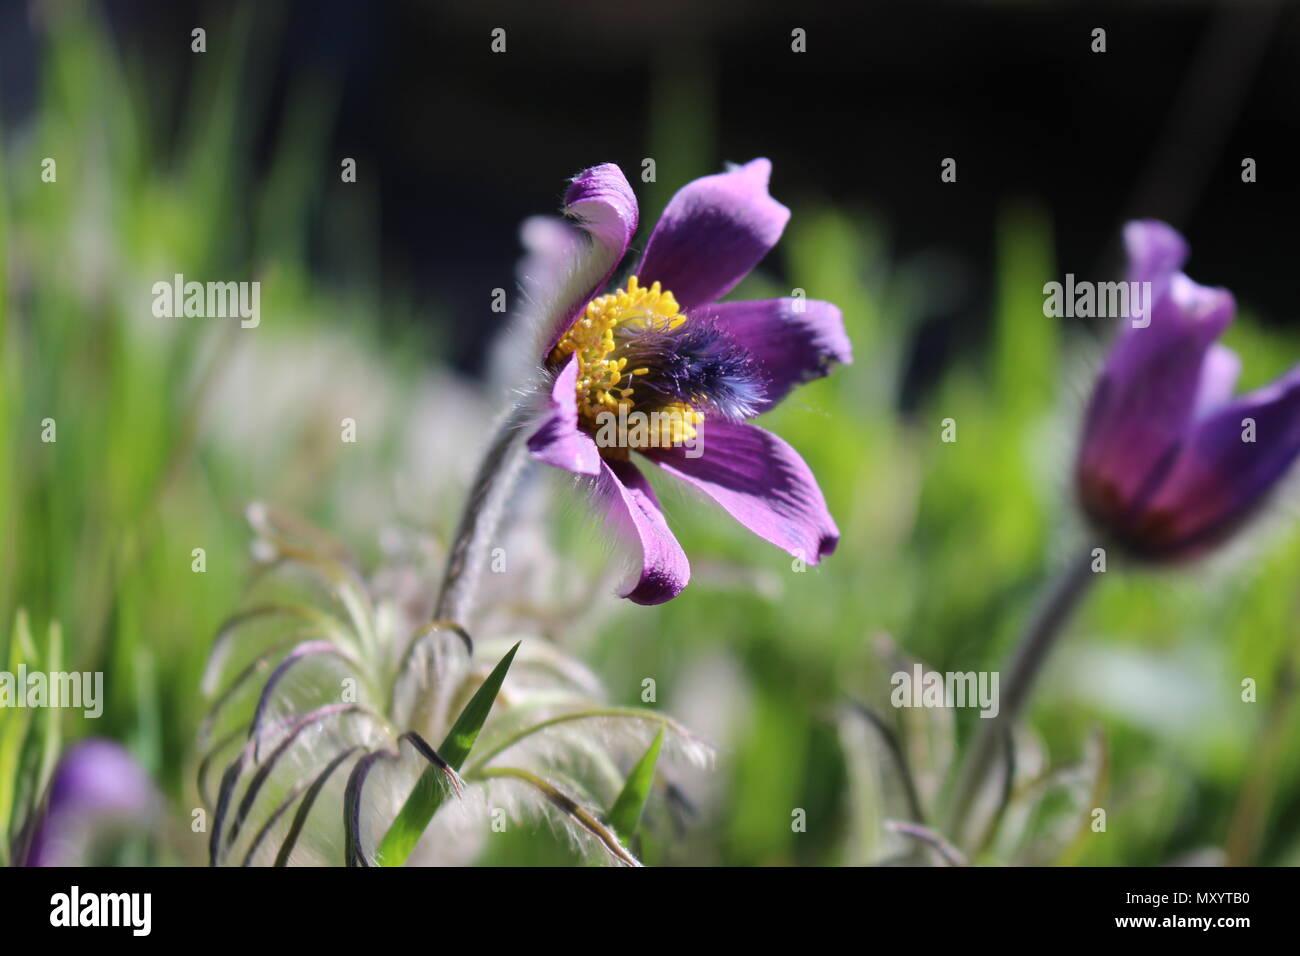 Purple Flower Of Wild Species Of Anemone Pulstailla Montana With